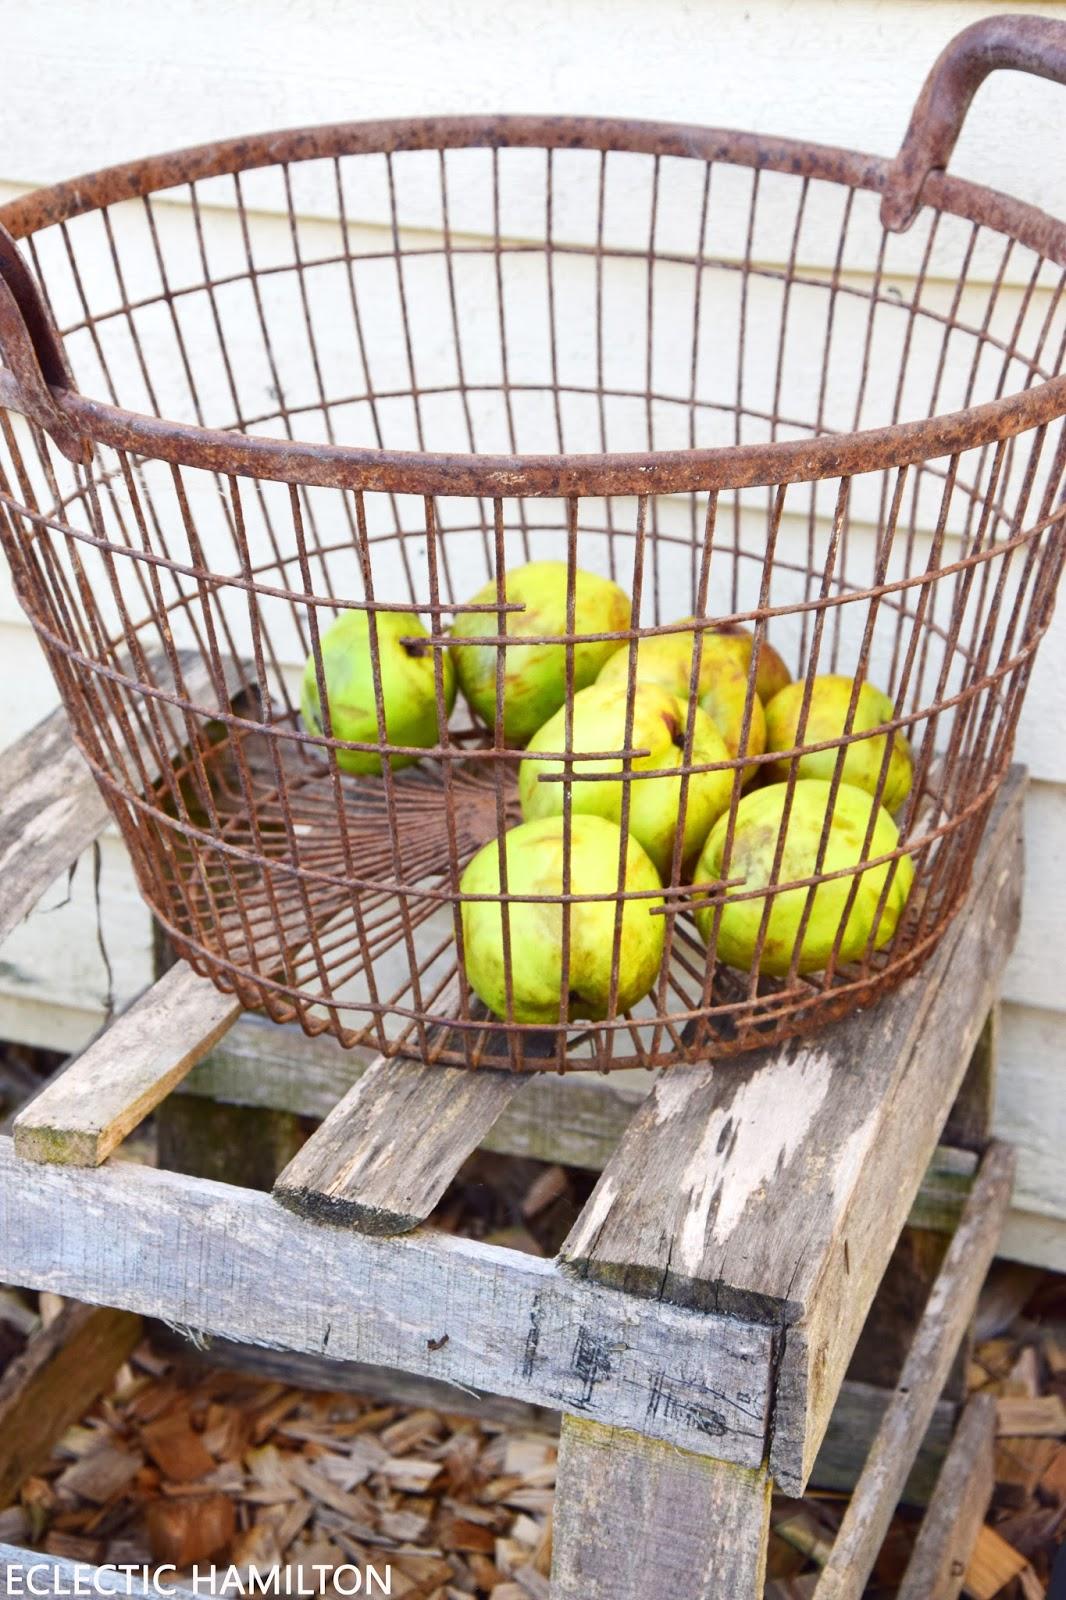 Äpfel sammeln leicht gemacht mit dem Rollsammler! Spätsommer, Herbst, Rücken, Rückenschonend, Tipps, Ratgeber, pflücken